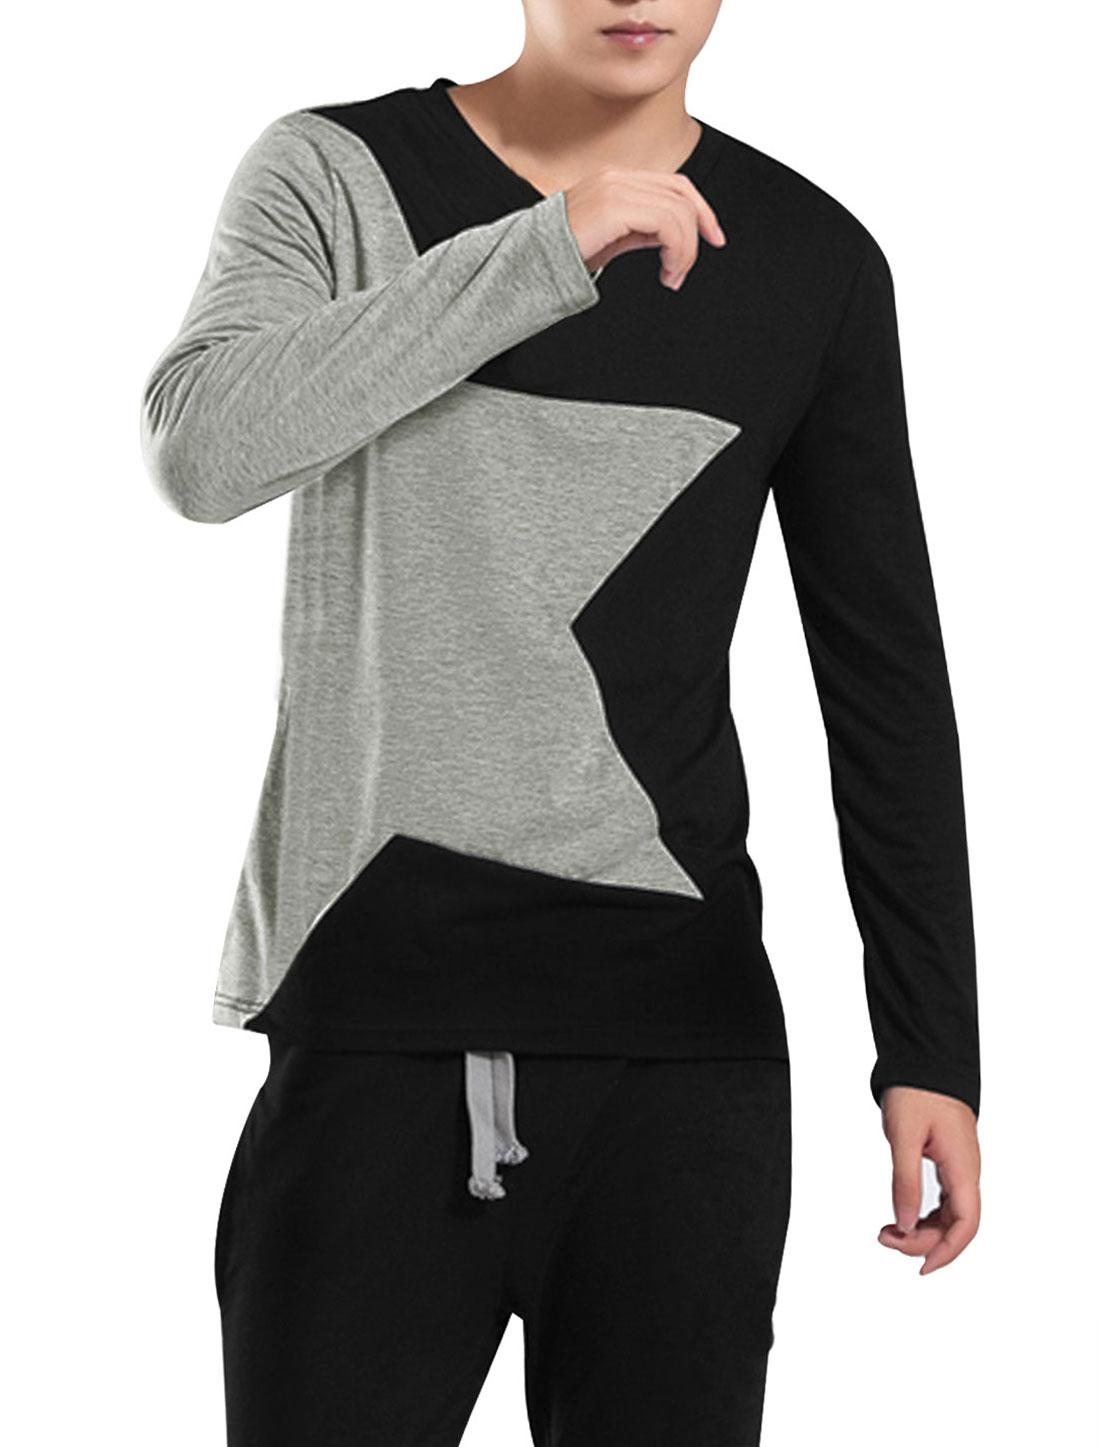 Autumn Slim Two-Tone Shirt for Men Black Light Gray M